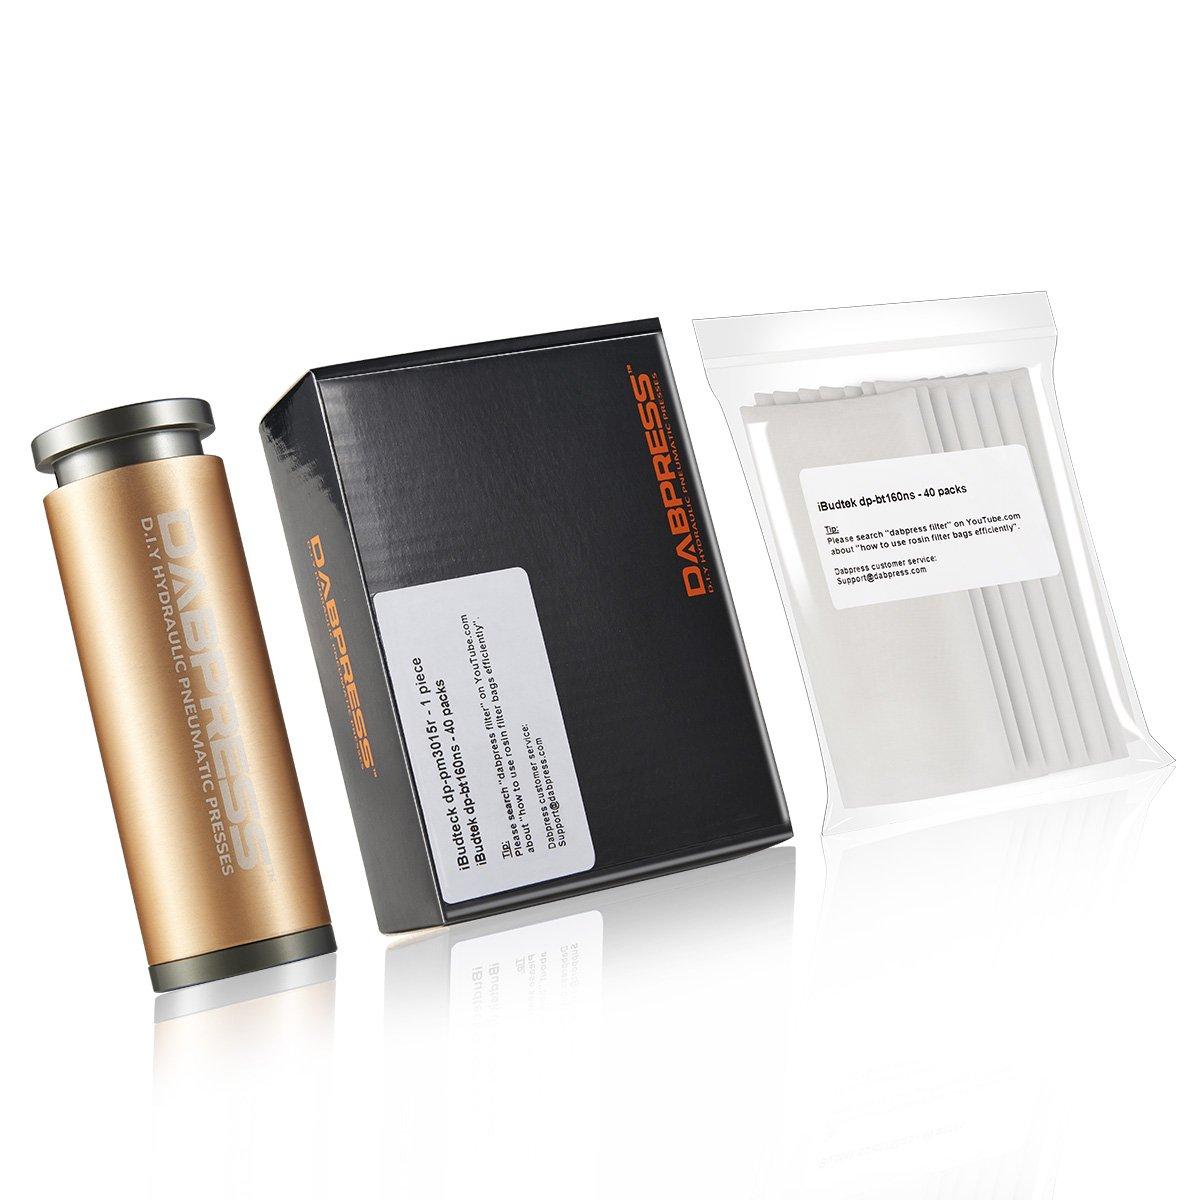 Cylinder Pre Press Mold + 40 Packs Filter Bags [2x4 Inch 160 Micron] | Dabpress dp-pm3015r + dp-bt160ns mg-bundle-bt160ns-pm3015r